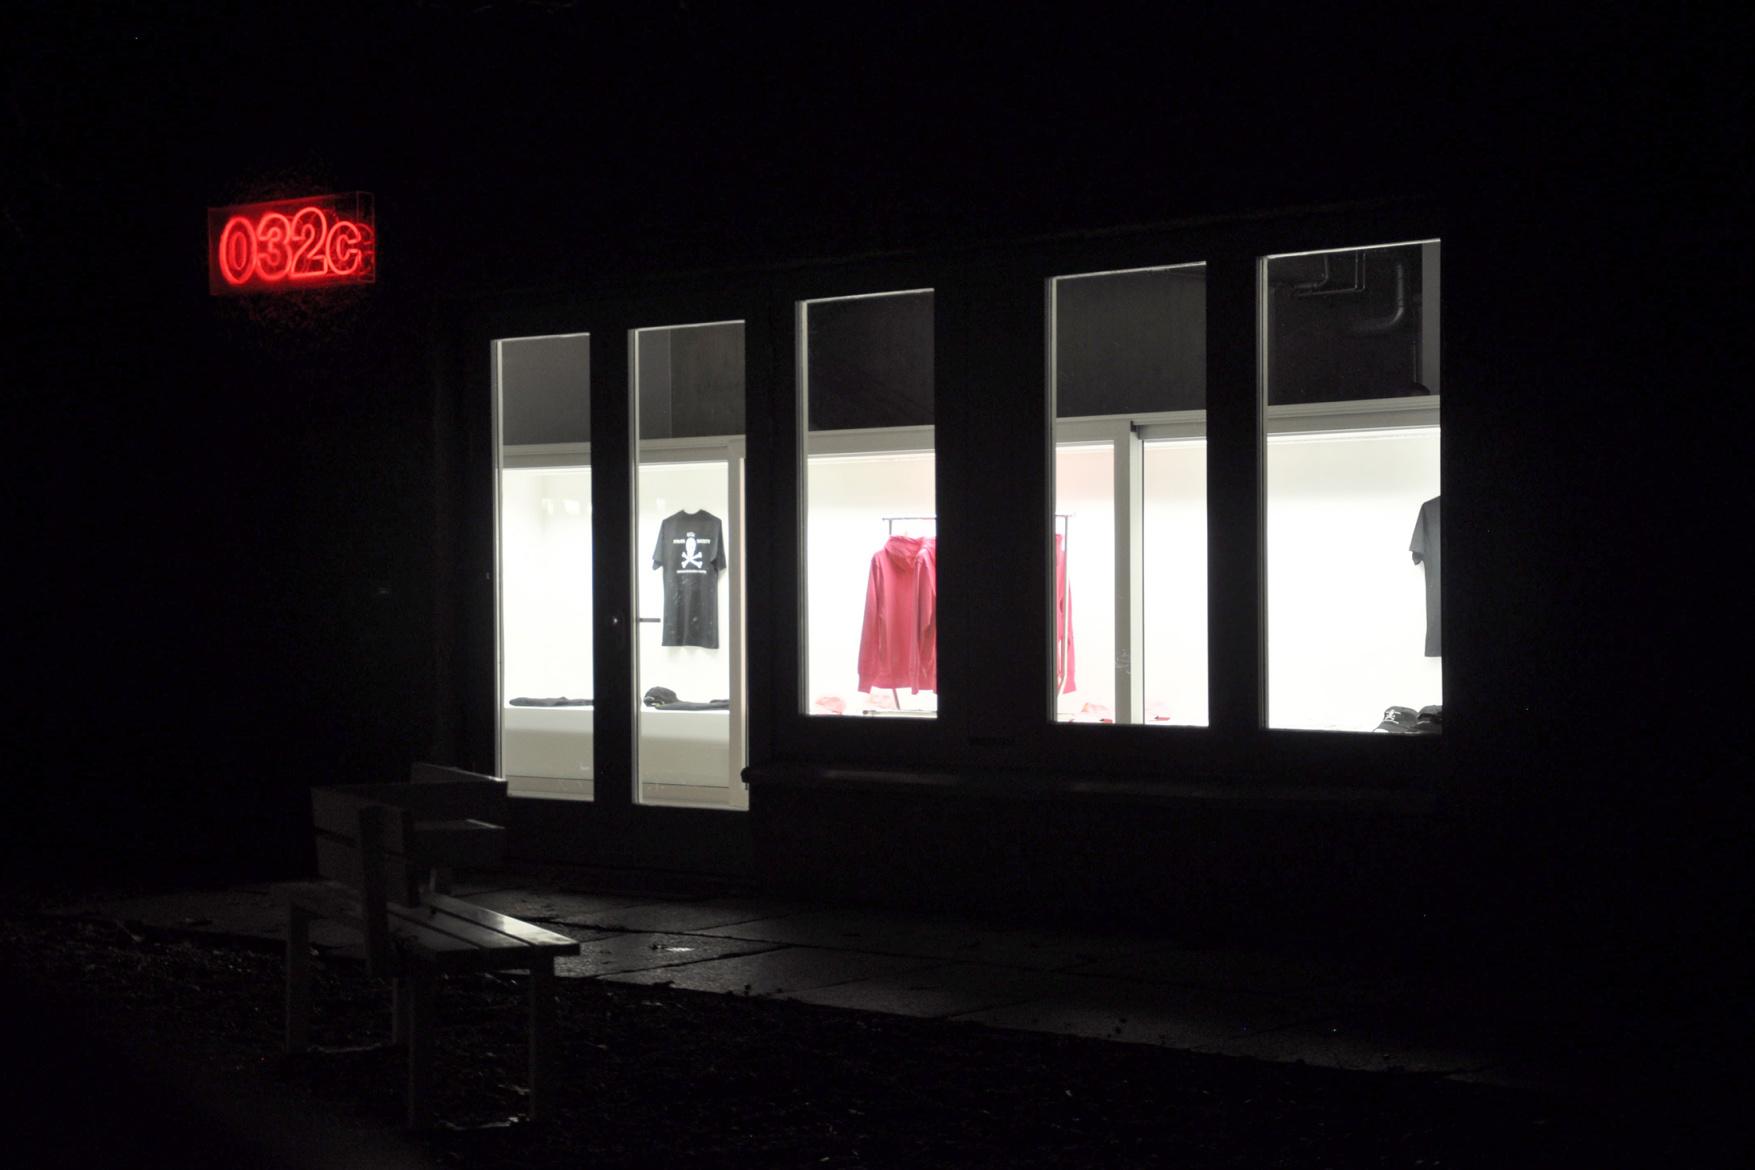 032c-store-opening-berlin-1